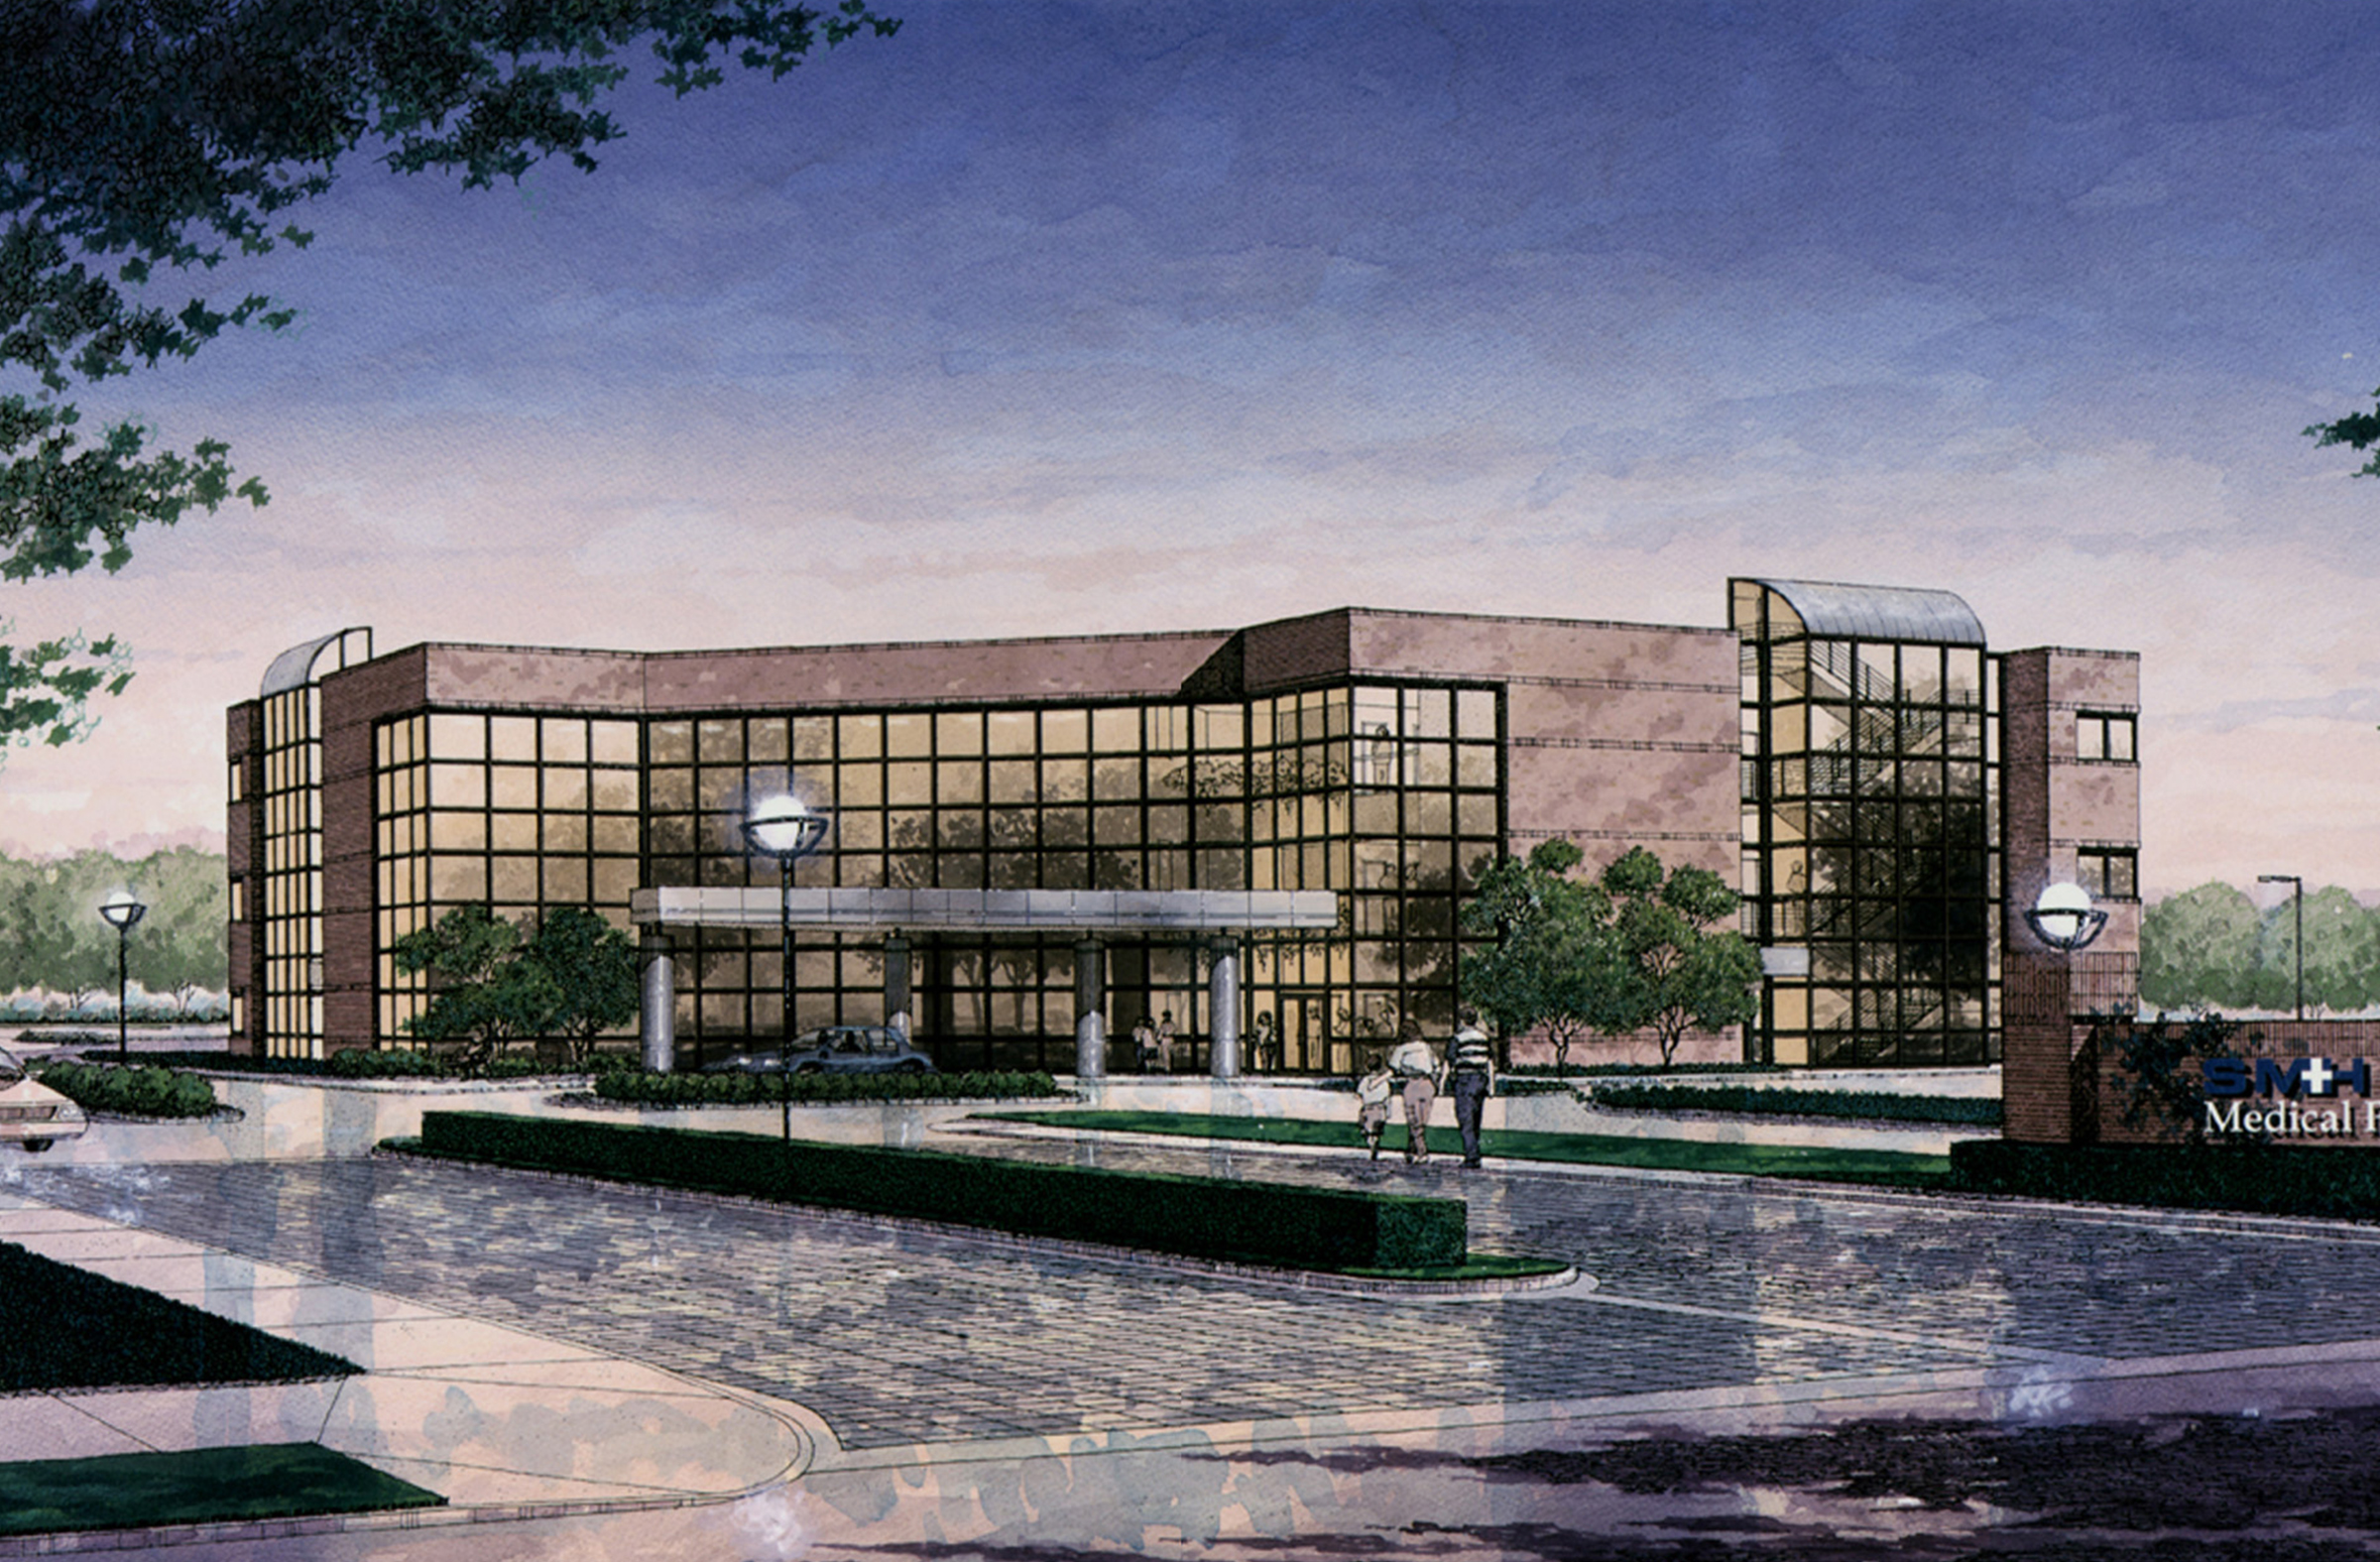 Slidell Memorial Hospital & Medical Center exterior rendering